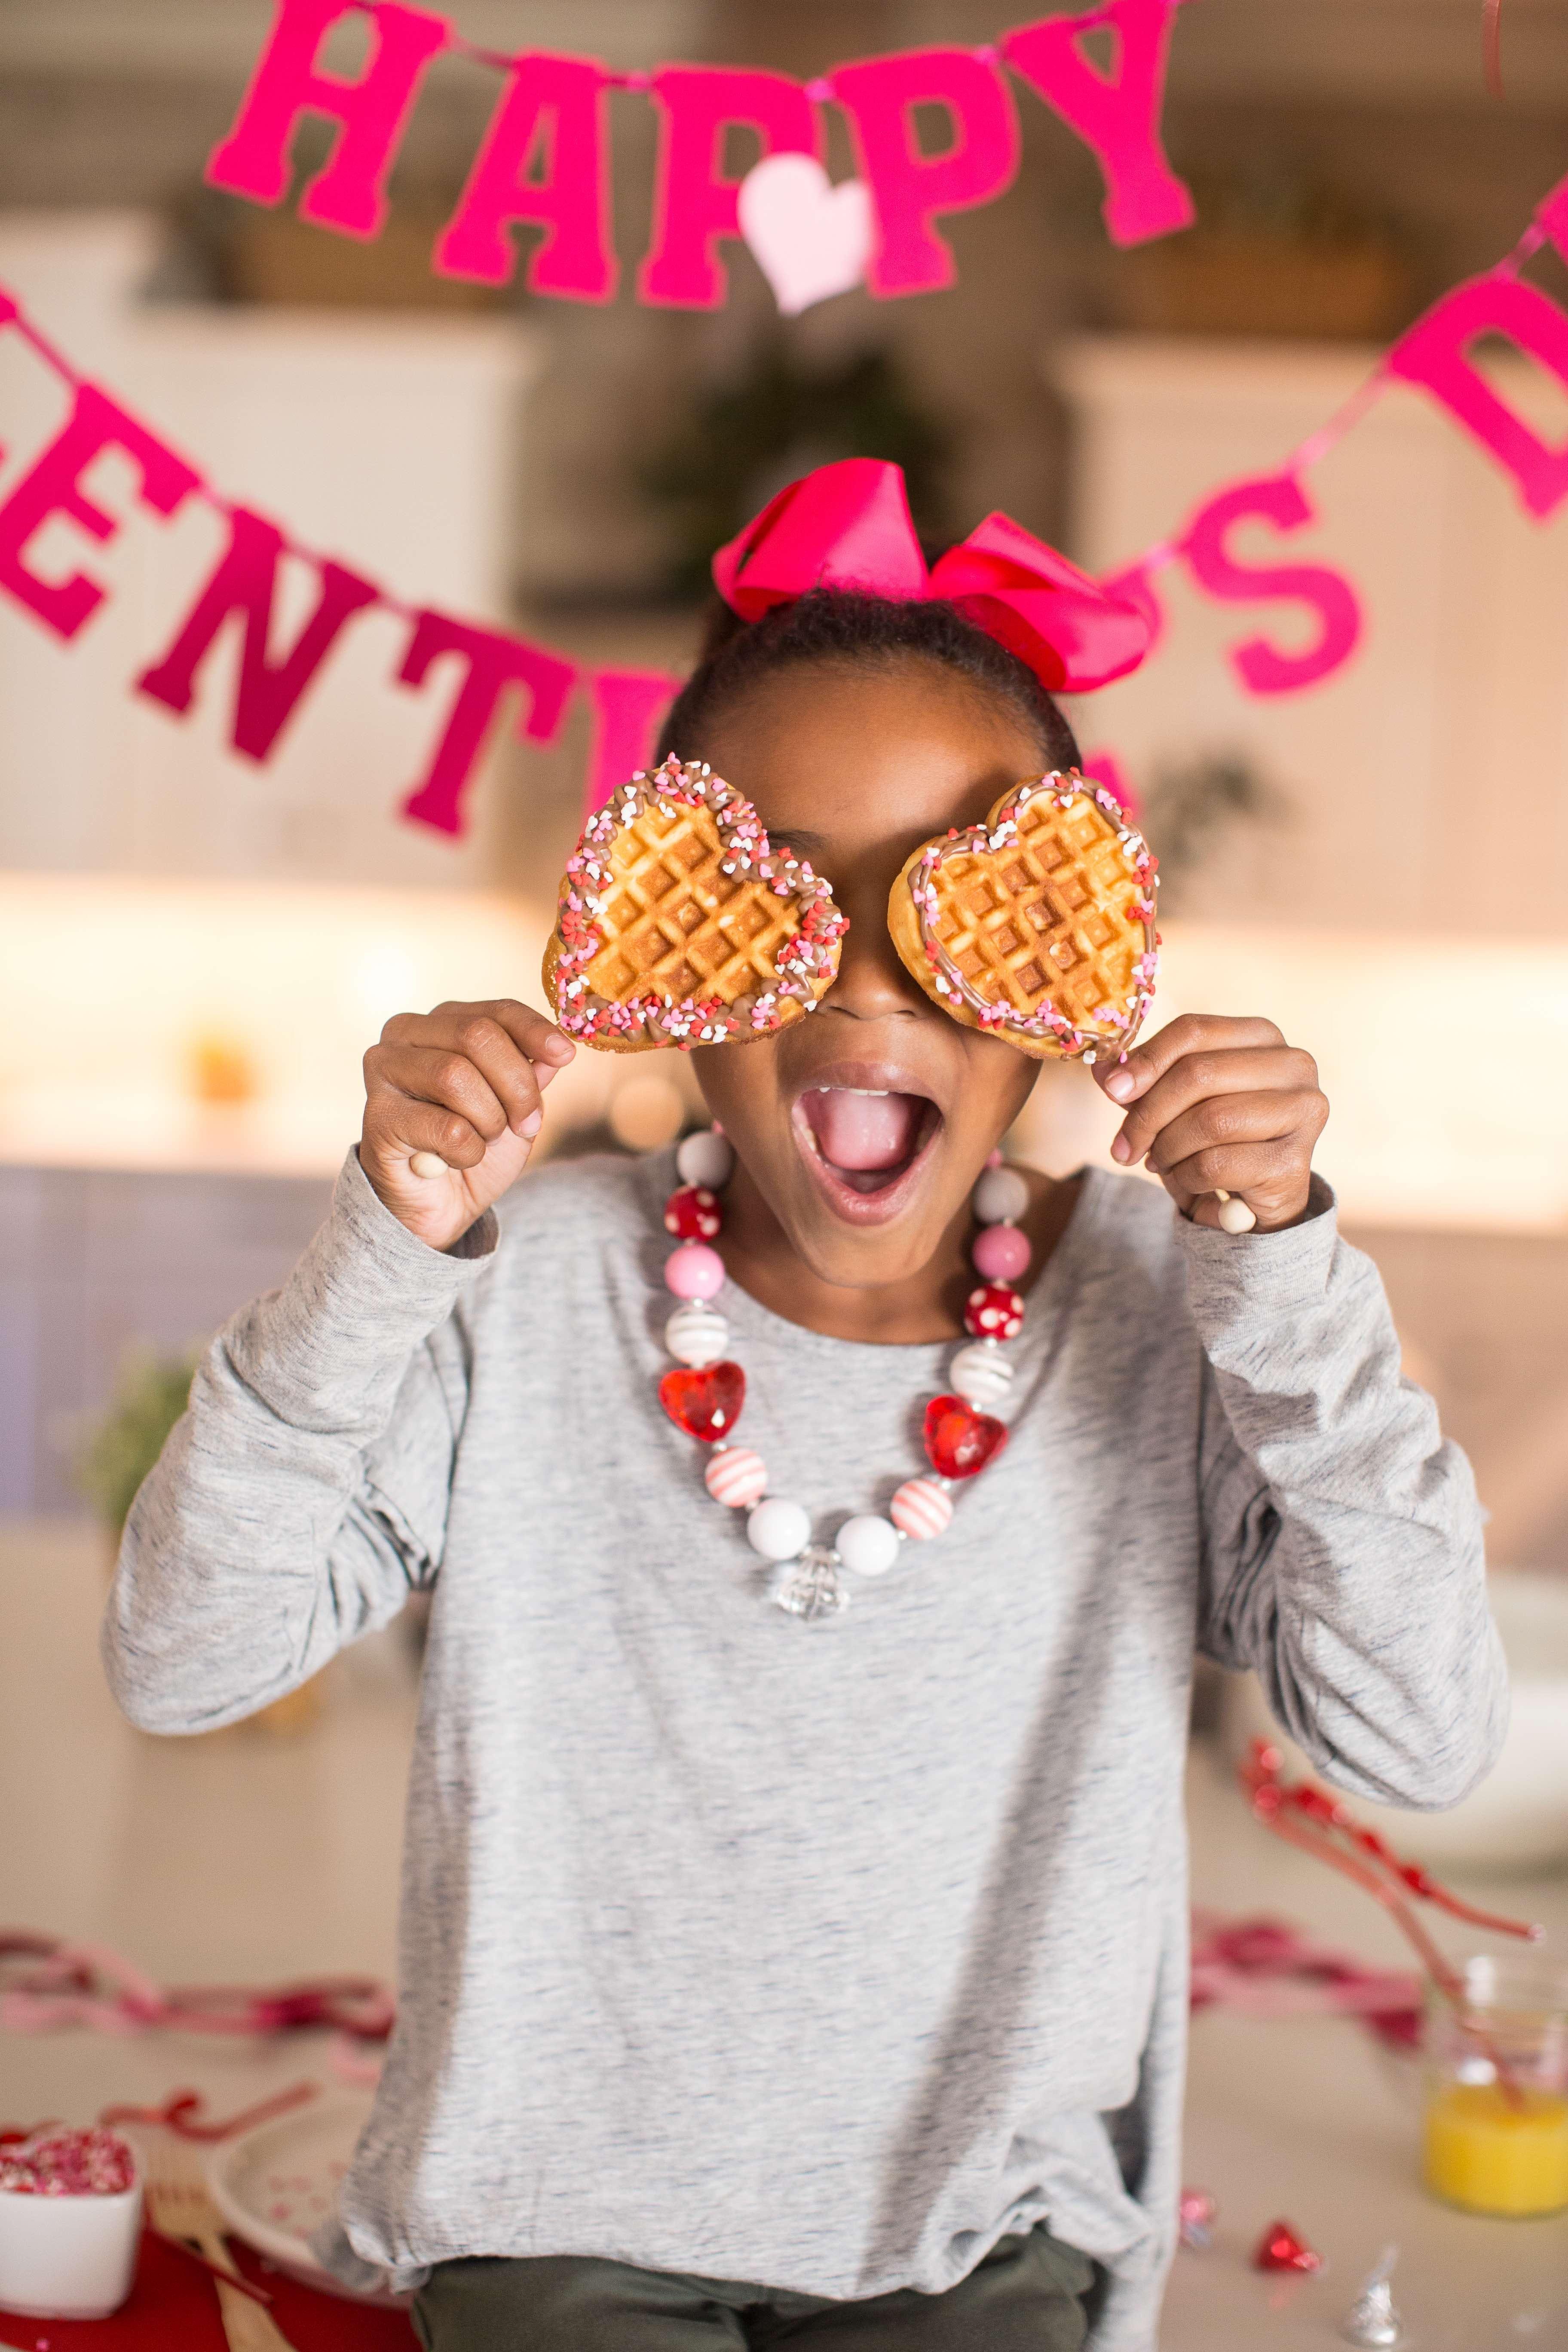 Valentines Heart Shaped Waffles Just Destiny 43 Resize